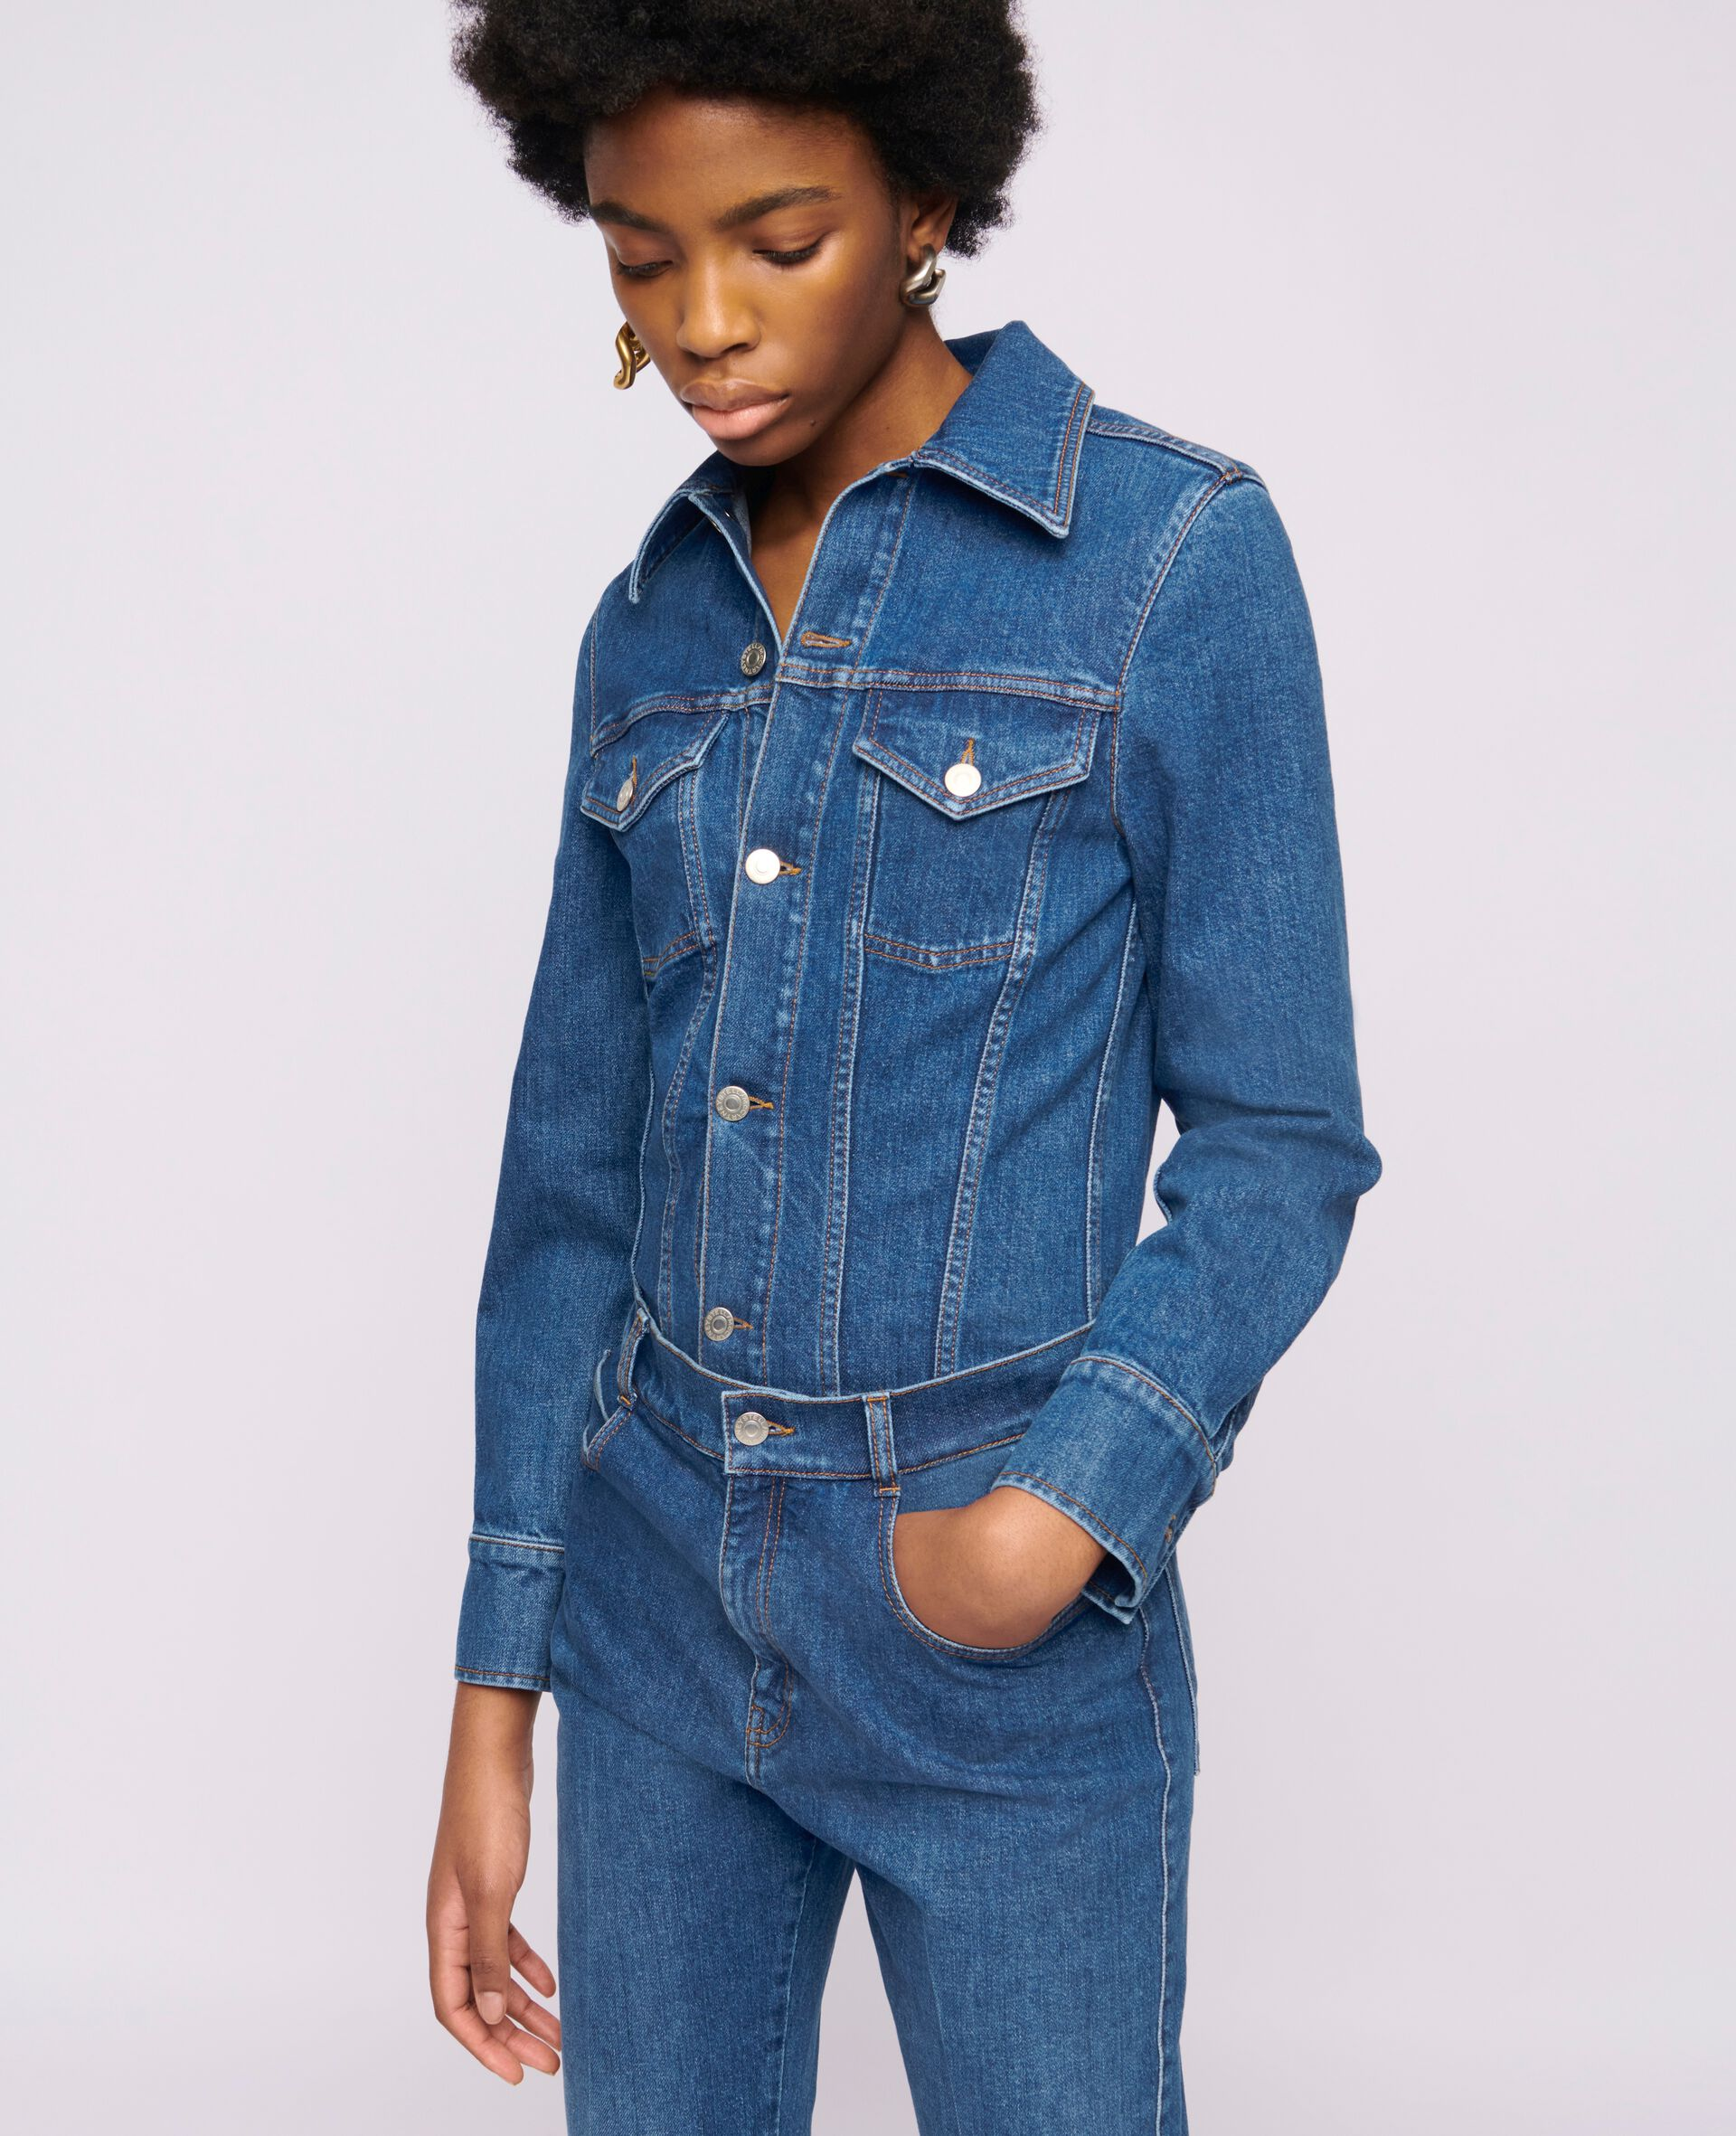 Denim-Jumpsuit in Vintage-Wäsche -Blau-large image number 3